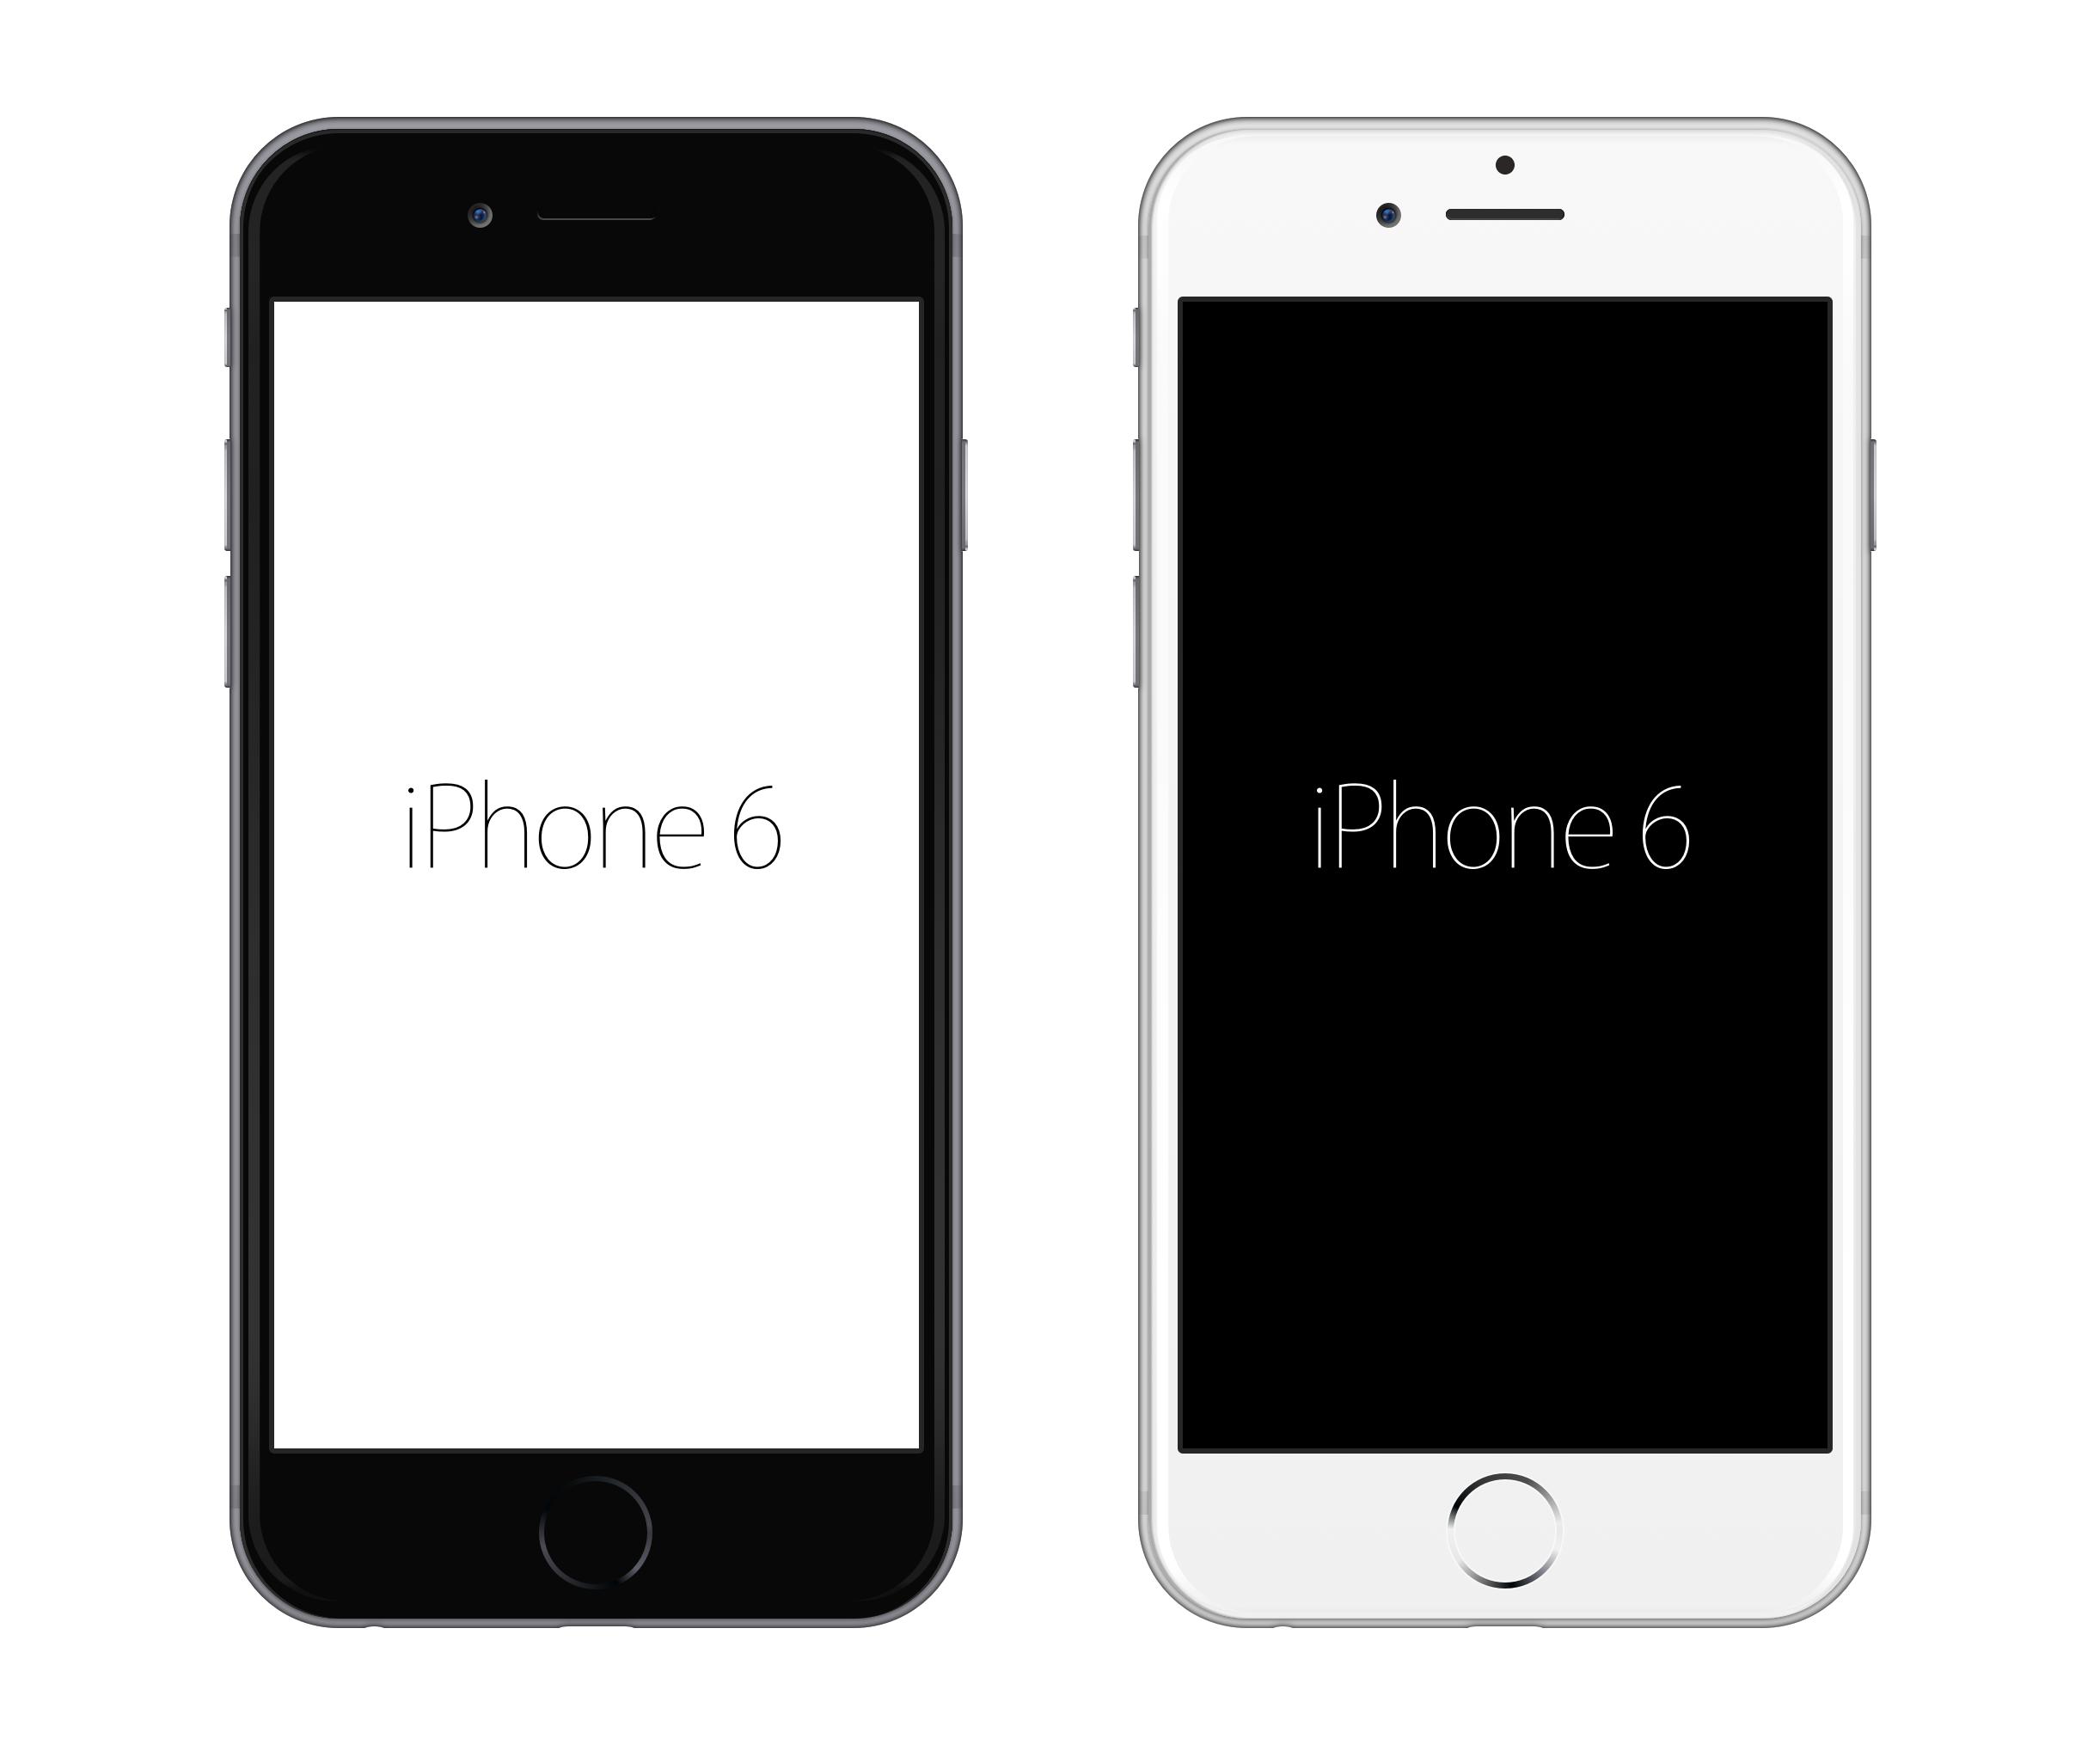 Iphone 6 biết bơi?